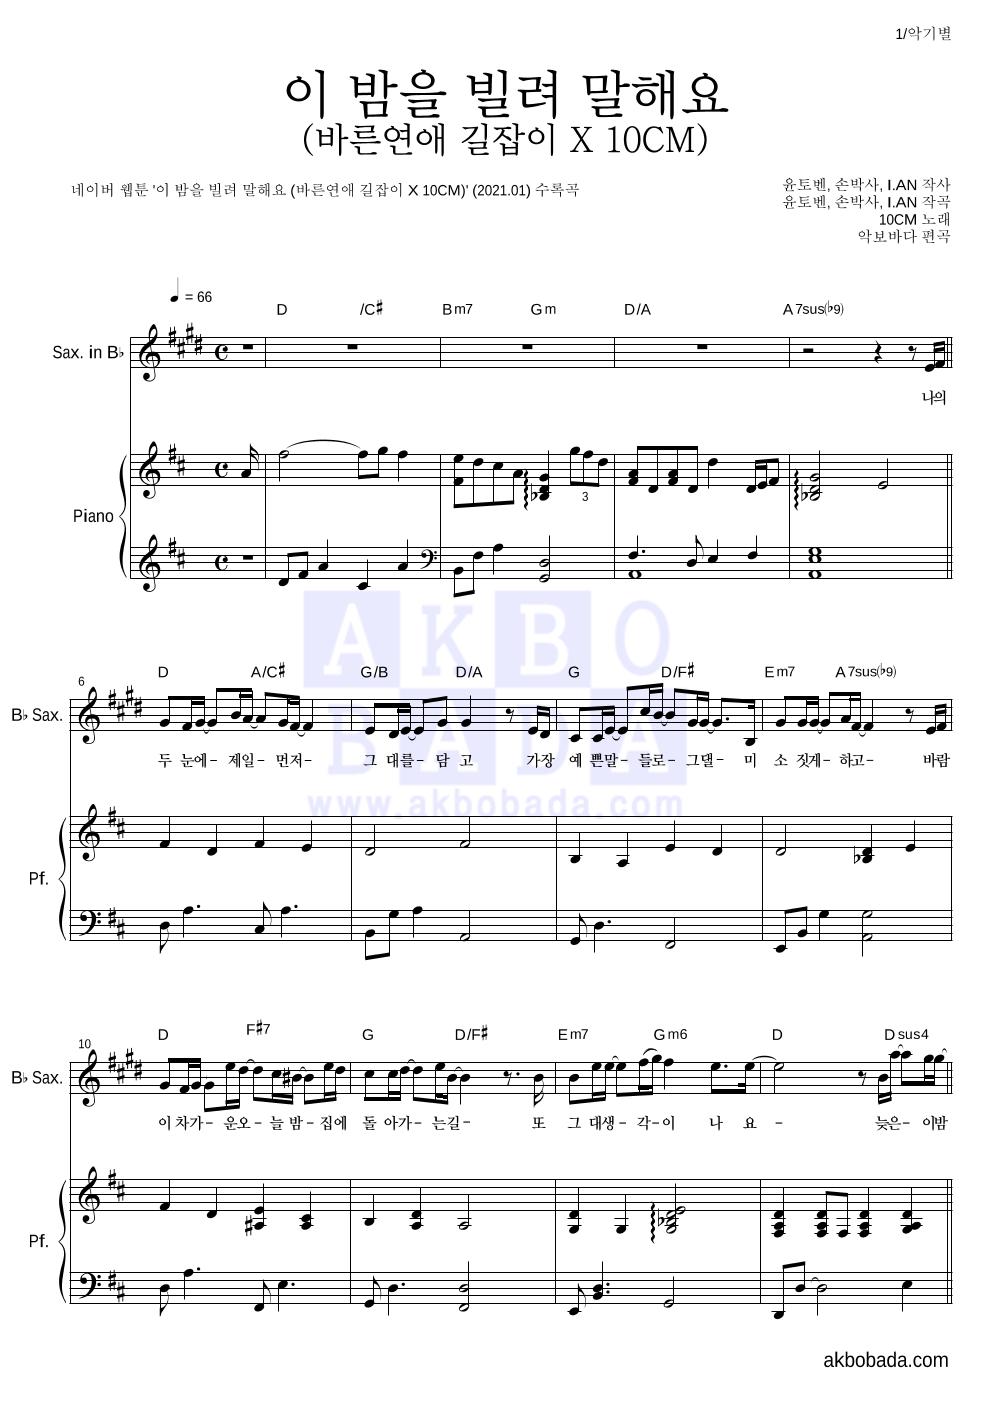 10CM - 이 밤을 빌려 말해요 (바른연애 길잡이 X 10CM) Bb색소폰&피아노 악보